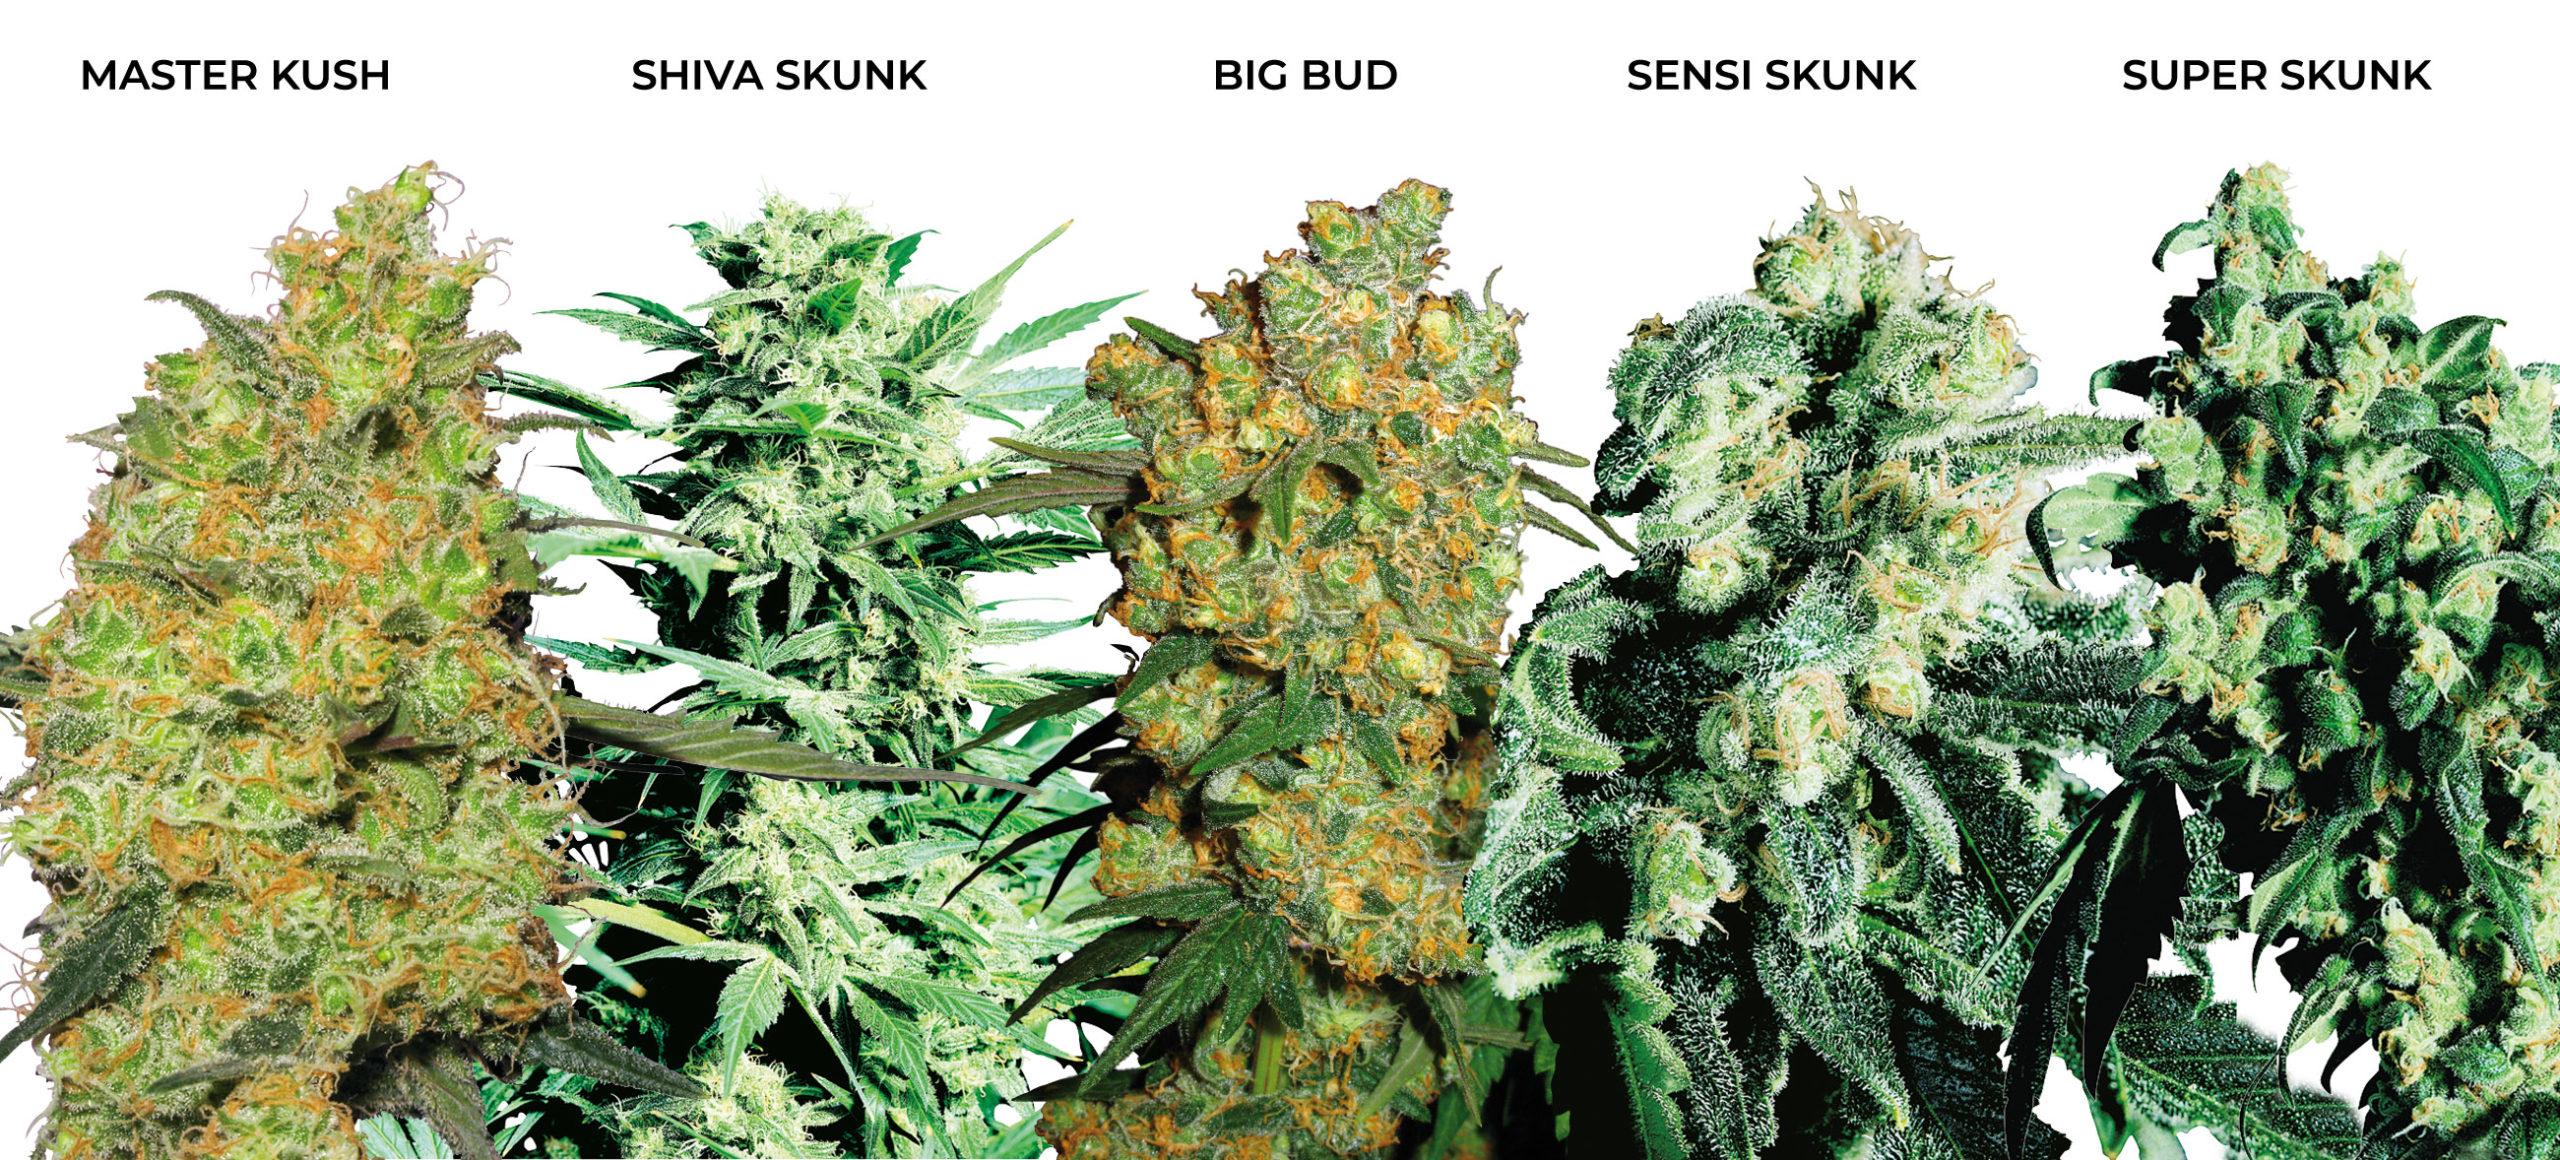 Medicinale cannabis met 5 grote indica-toppen. Master Kush, Shiva Skunk, Big Bud, Sensi Skunk en Super Skunk.